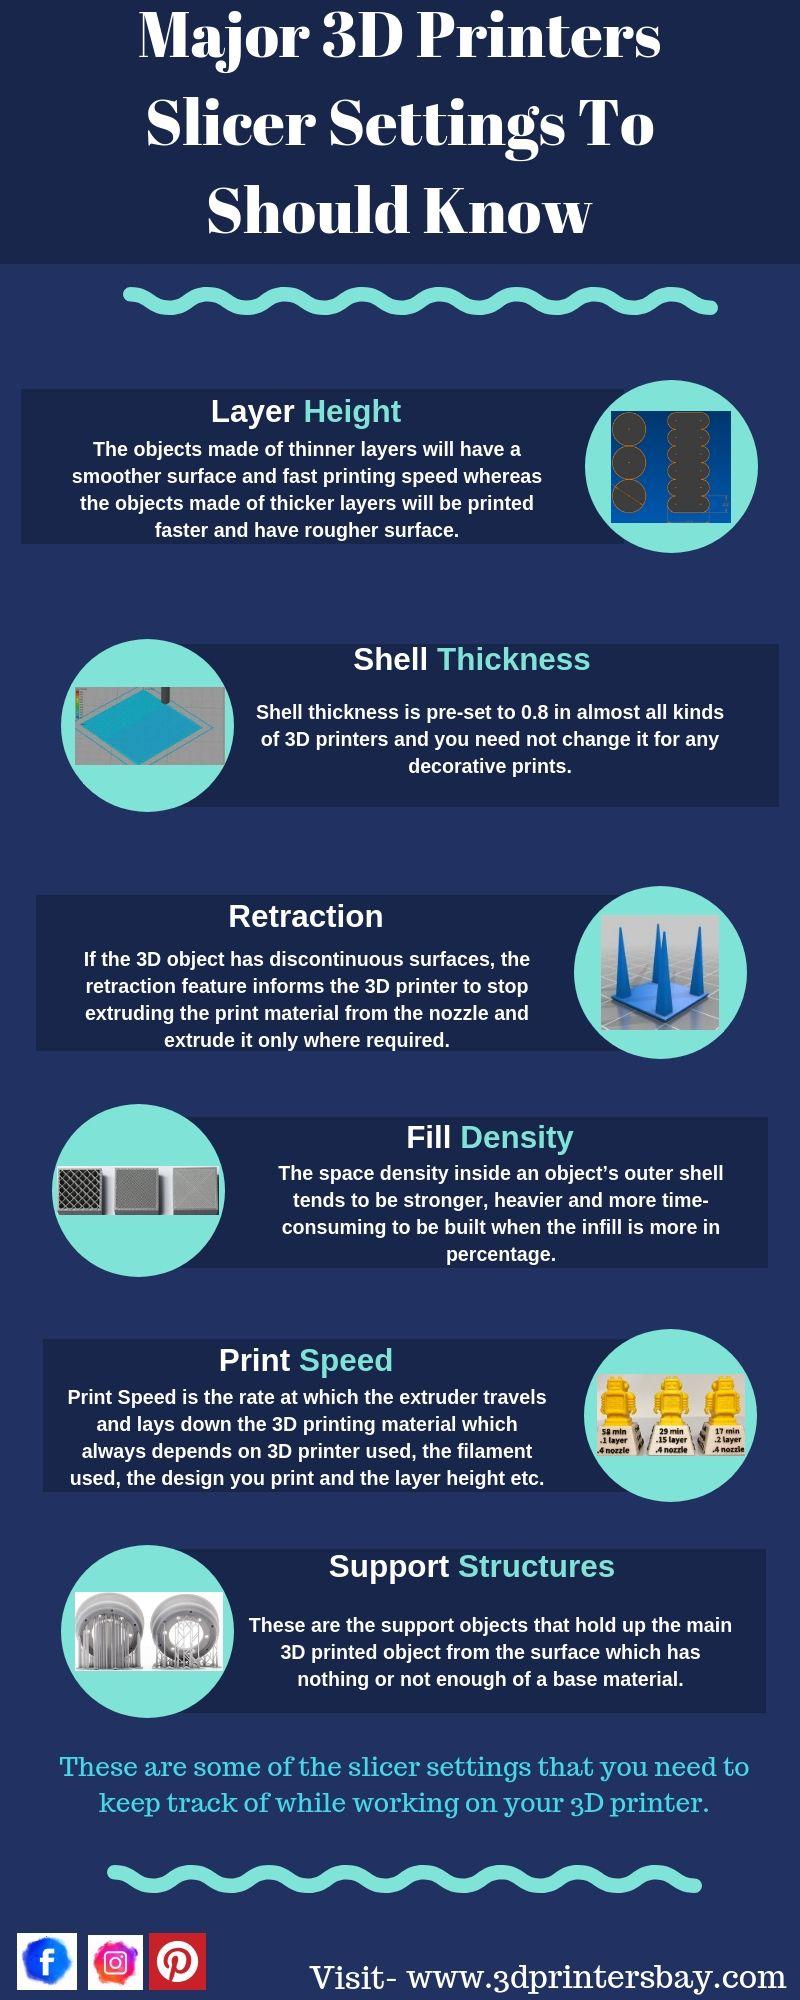 Anet 3D High Precision Quality Reprap Prusa i3 DIY Kit   Major 3D